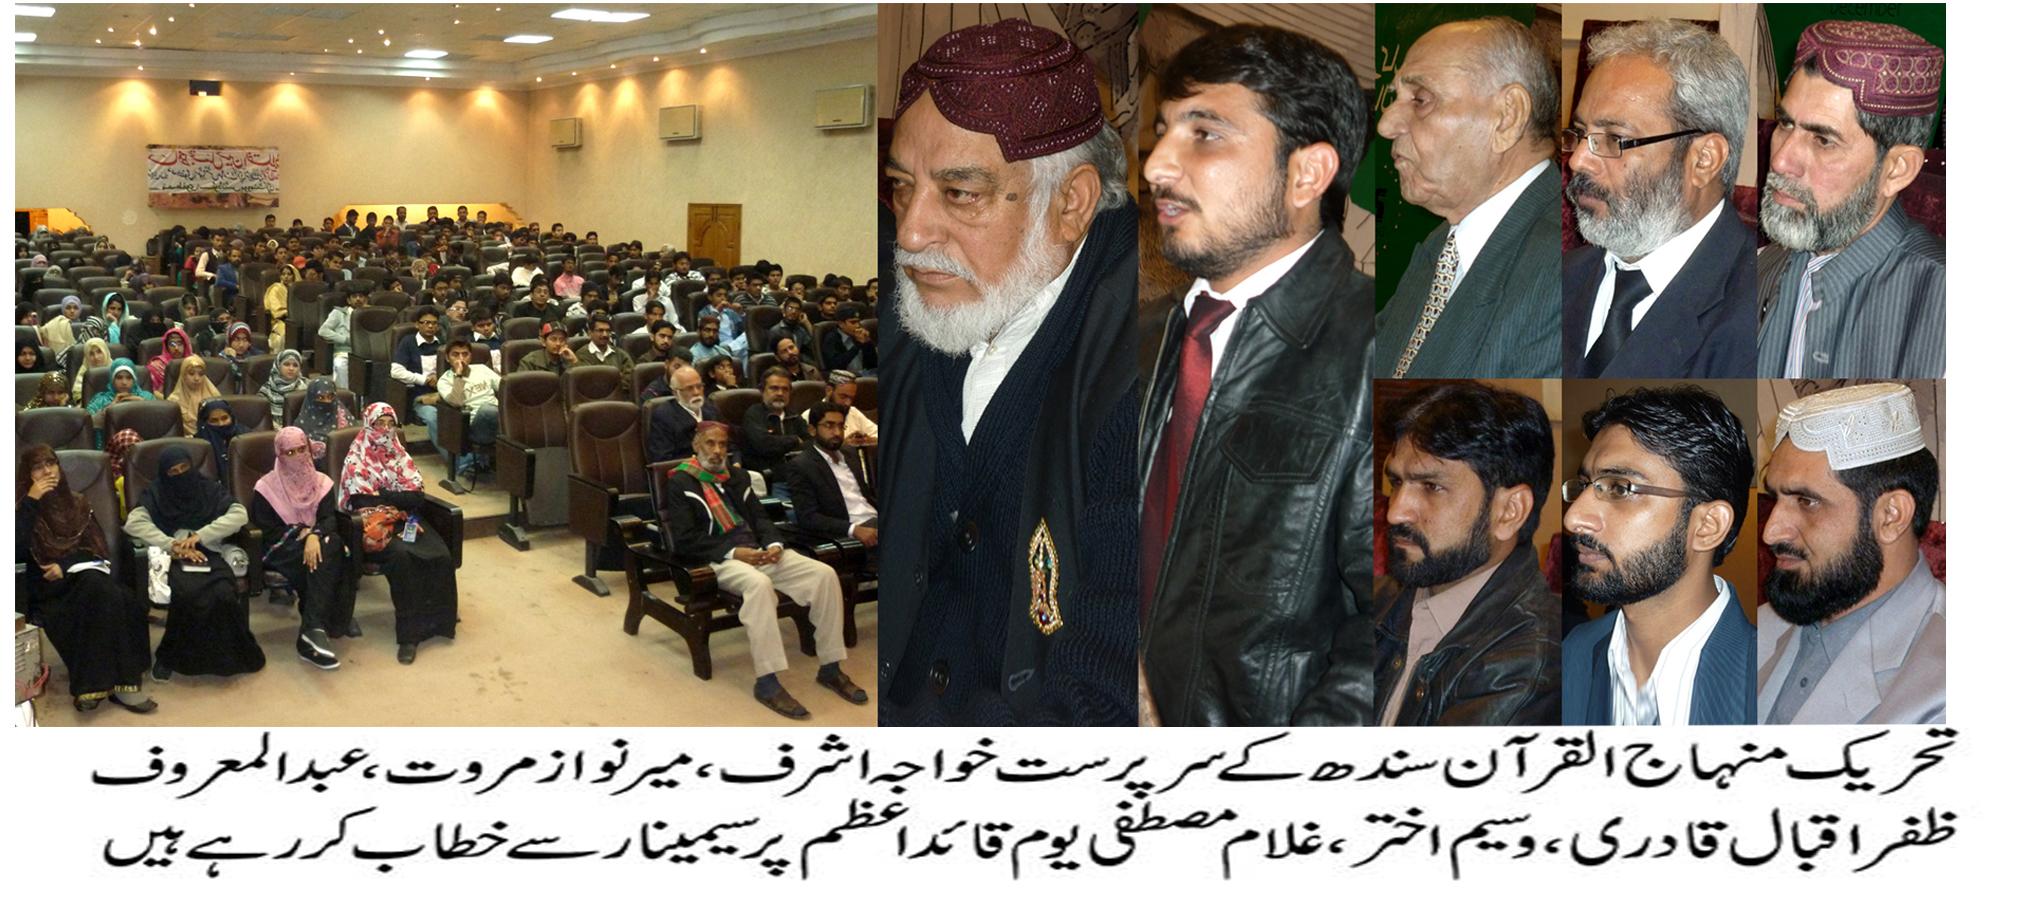 تحریک منہاج القرآن Minhaj-ul-Quran  Print Media Coverage پرنٹ میڈیا کوریج Daily Kainat Page-2